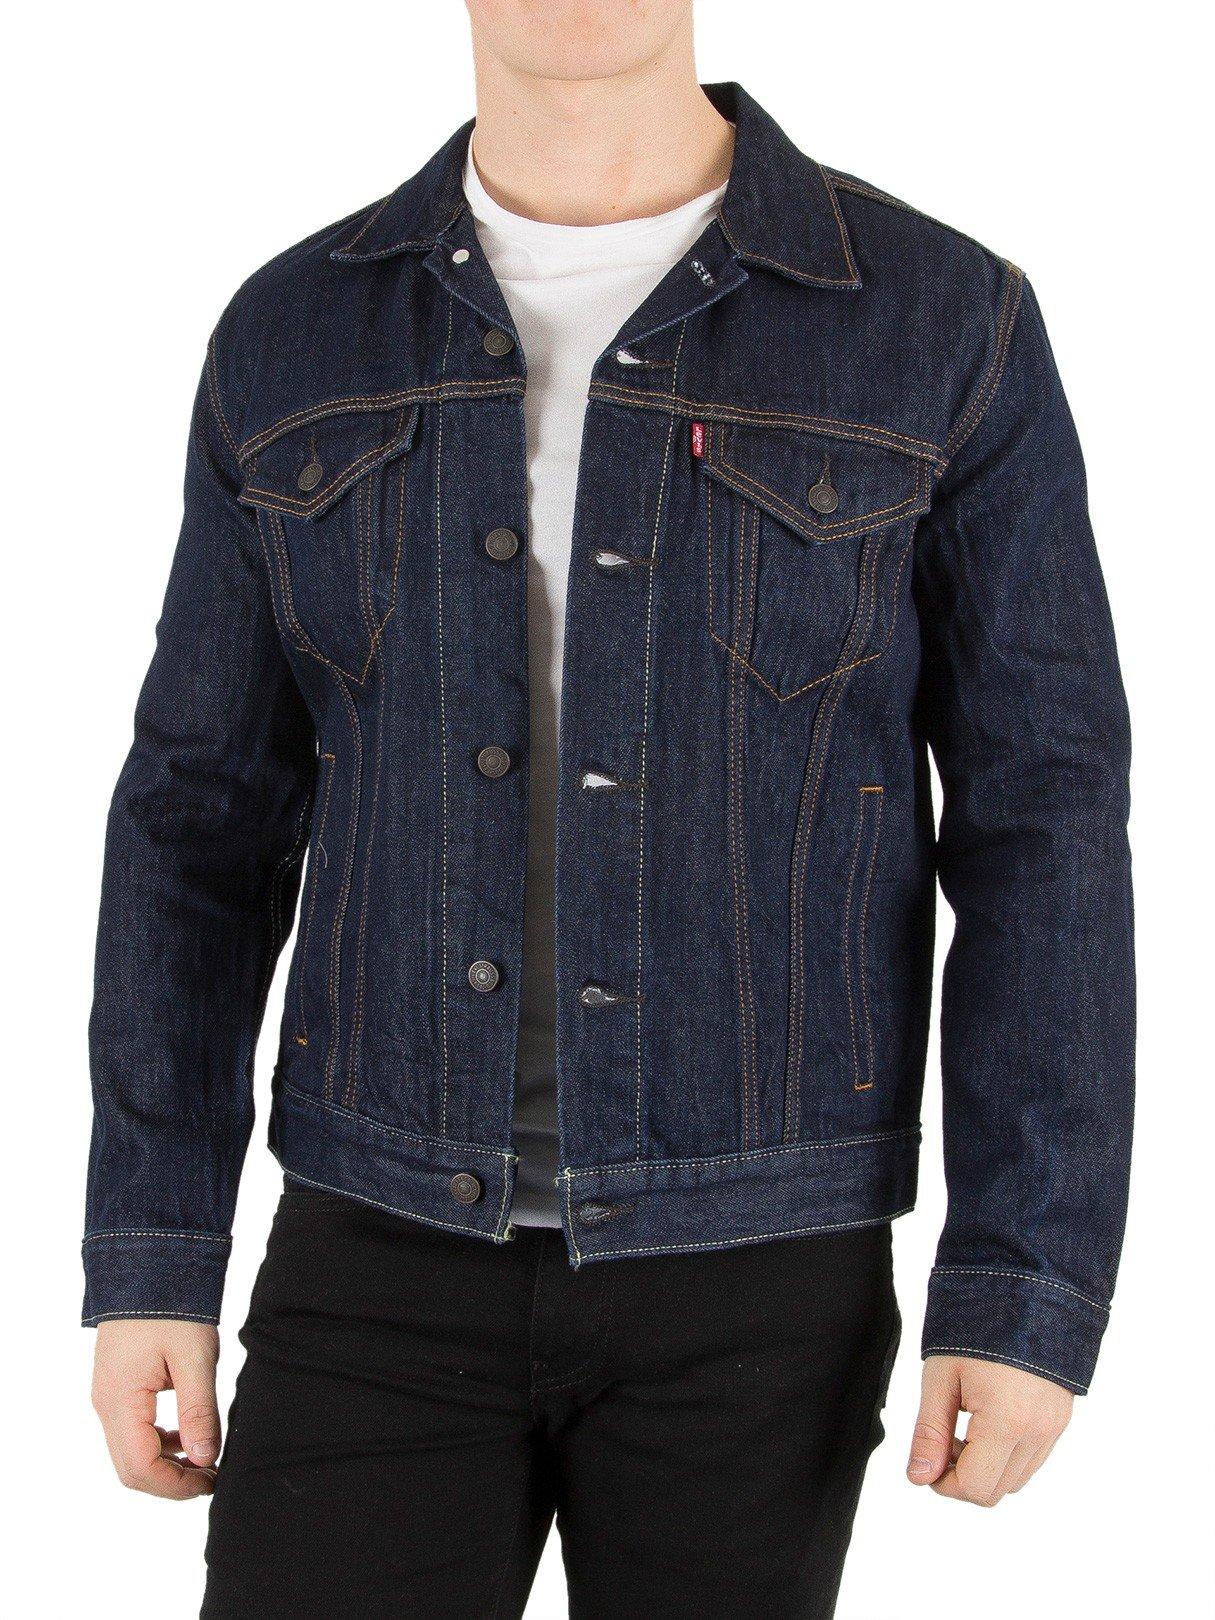 Levi's Men's Trucker Rinse Jacket, Blue, Large